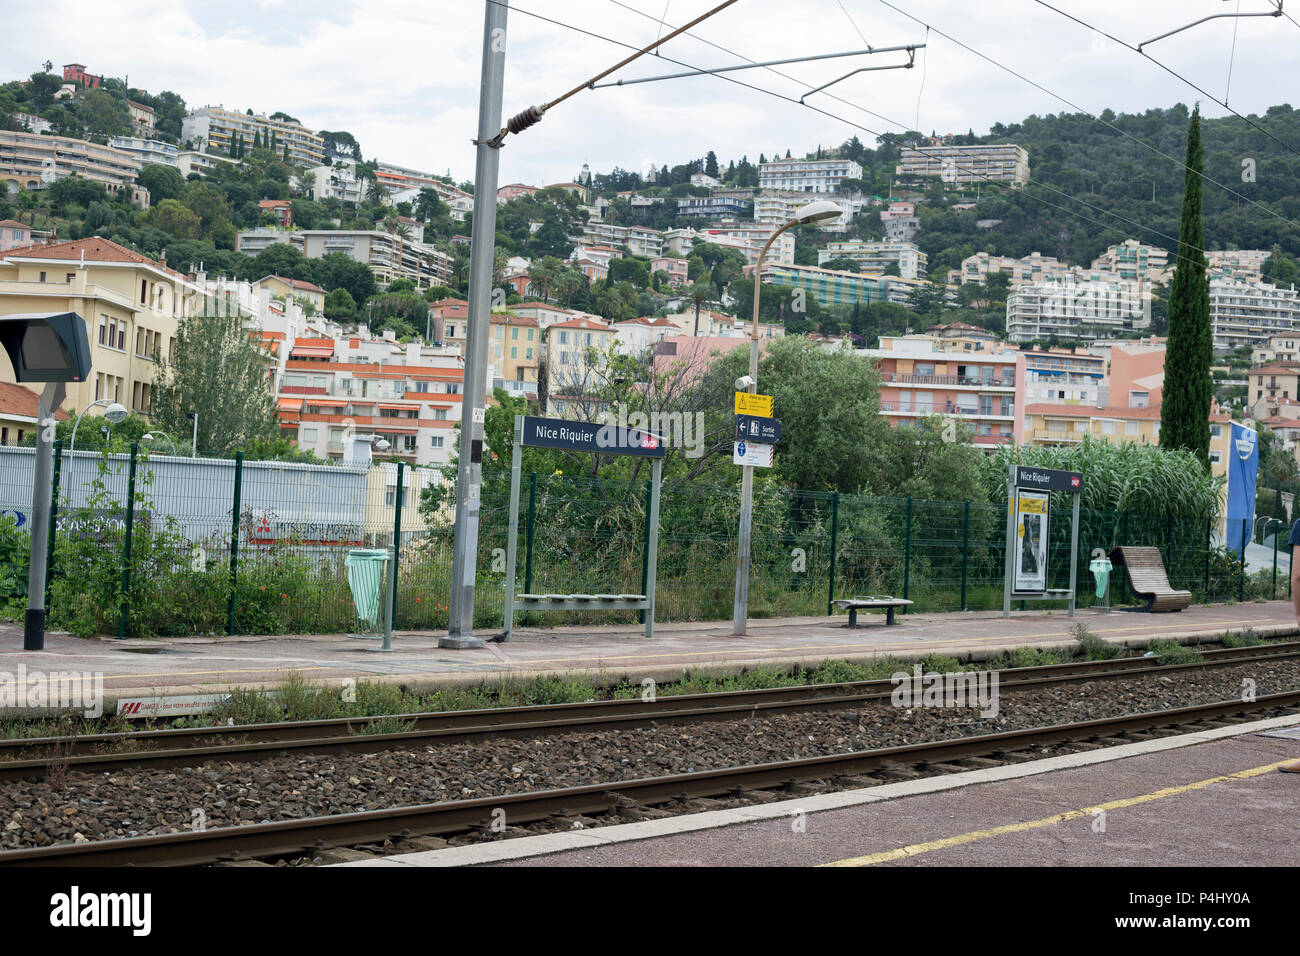 Nice Riquer, Cote D' Azur, France, June 2018, A view of the train station latform - Stock Image